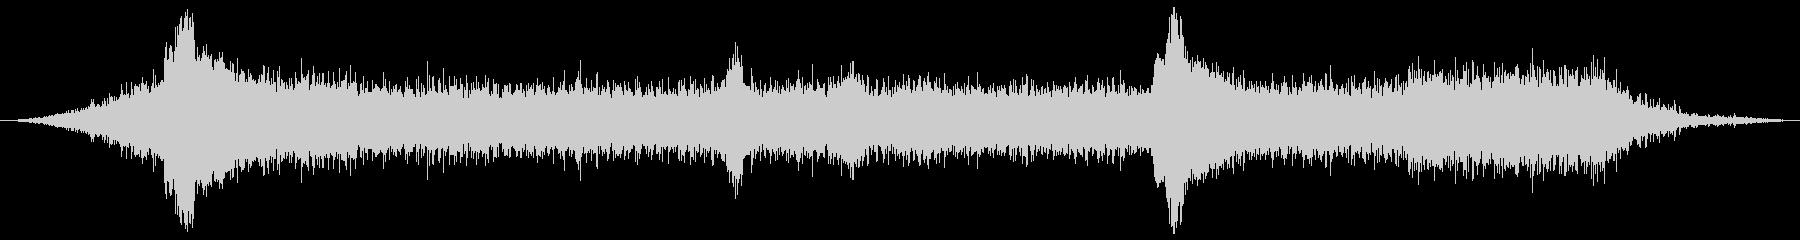 18 Wheeler Transp...の未再生の波形